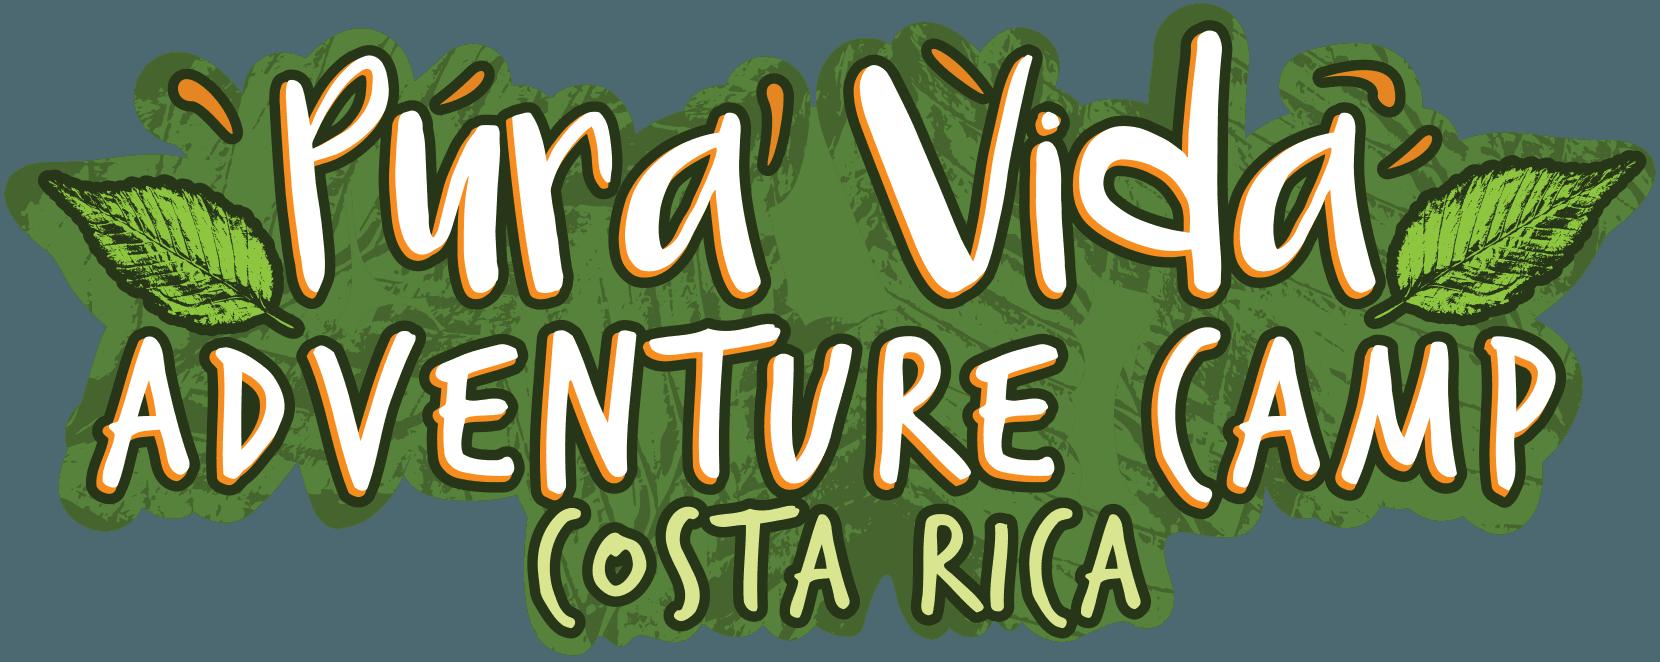 Pura Vida Adventure Camp